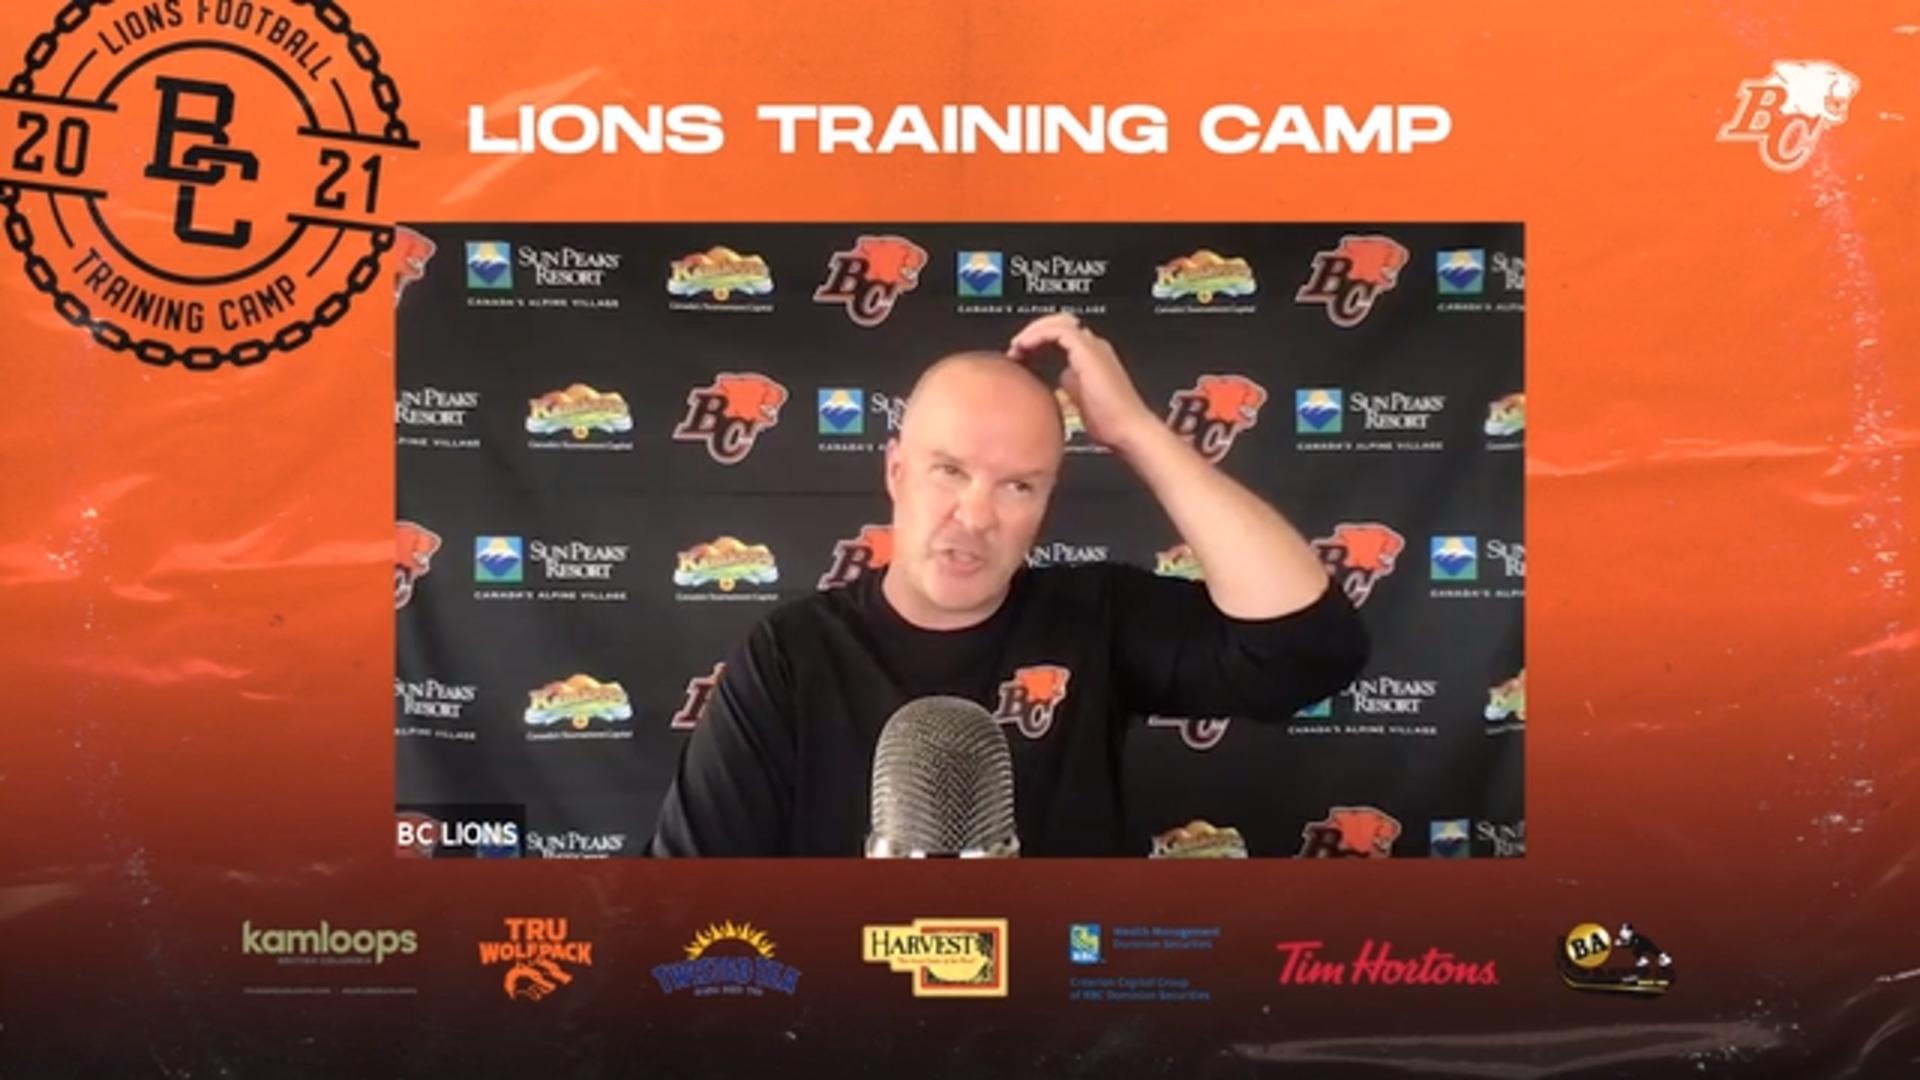 Training Camp July 20 | Rick Campbell